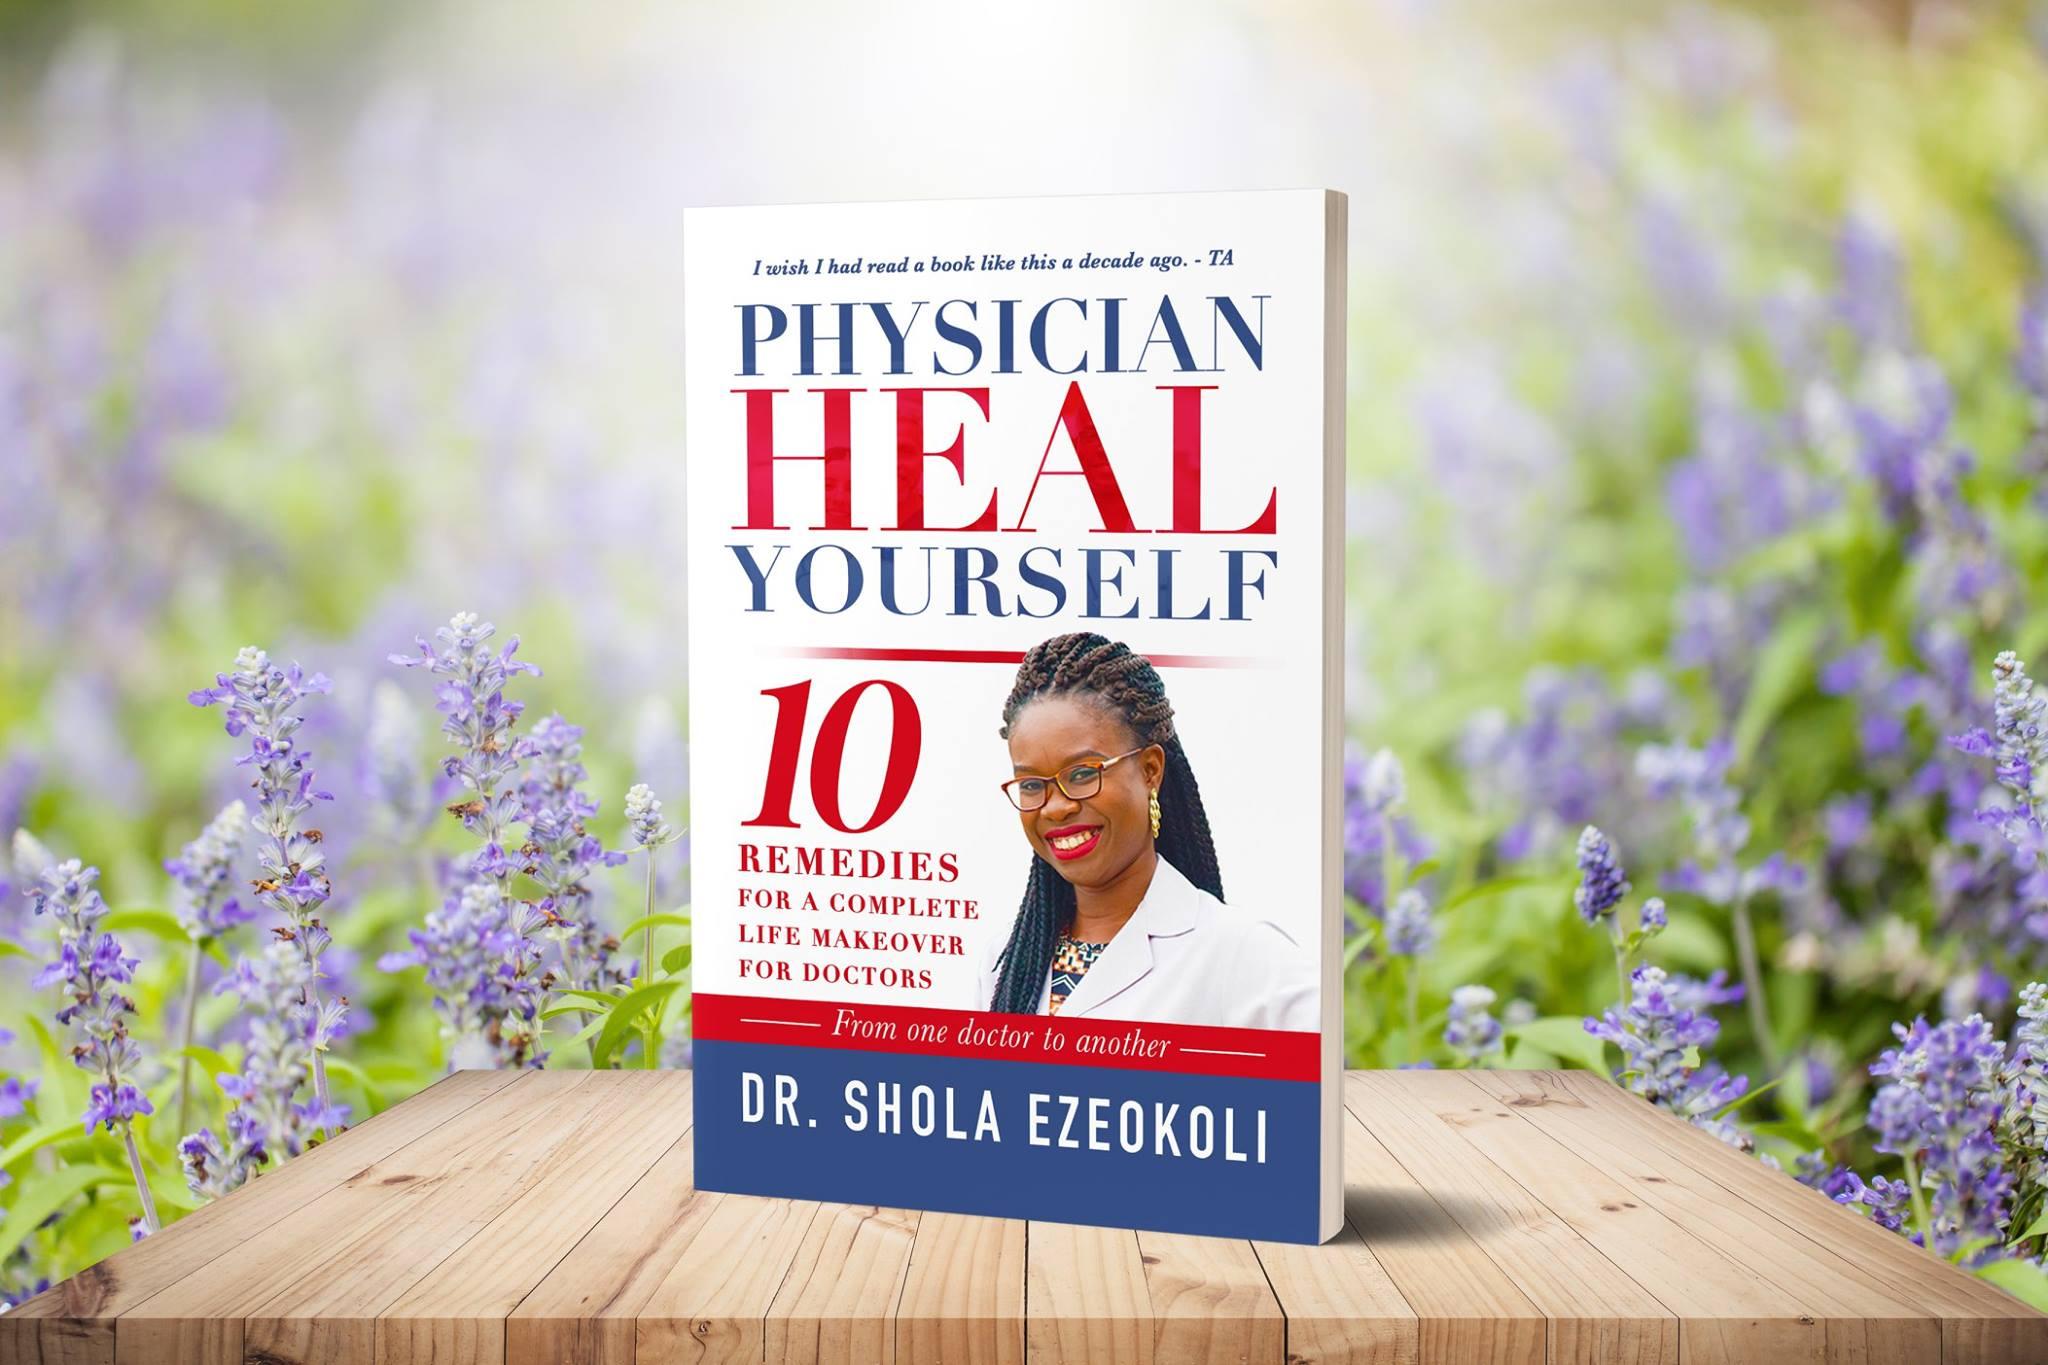 DR. SHOLA BOOK MOCKUP 6